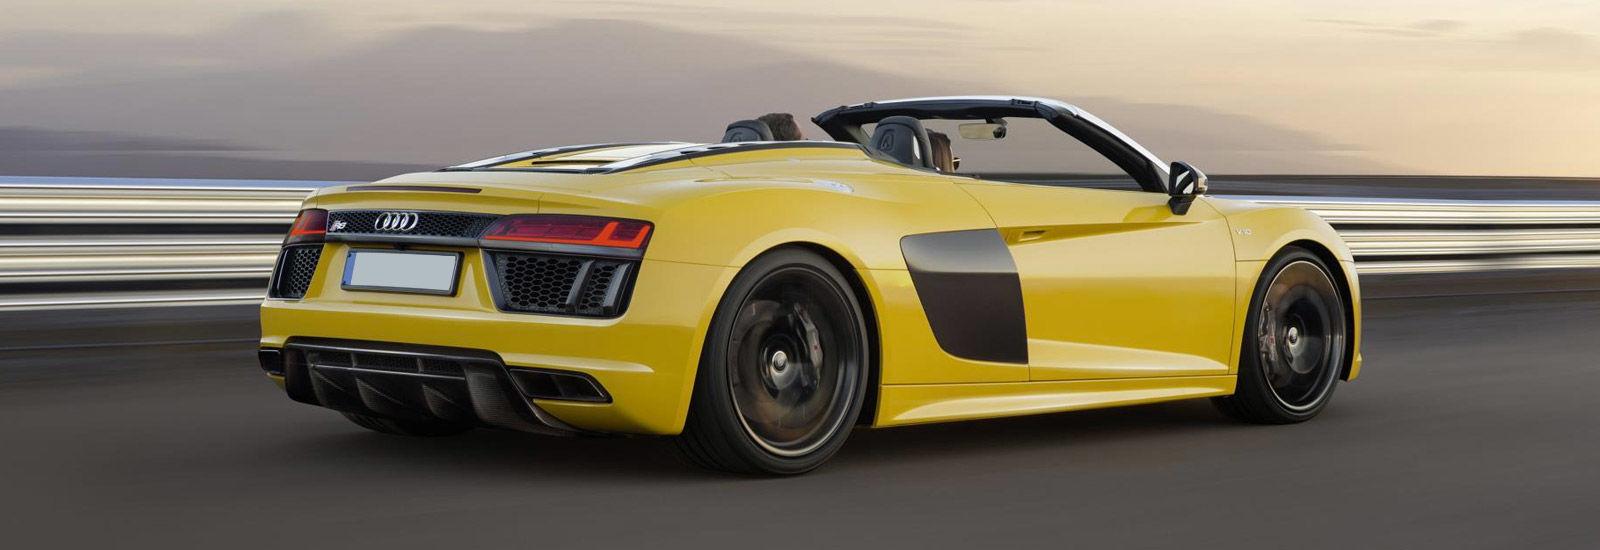 Audi audi r8 spyder v10 : Audi R8 V10 Spyder price, specs and release date | carwow